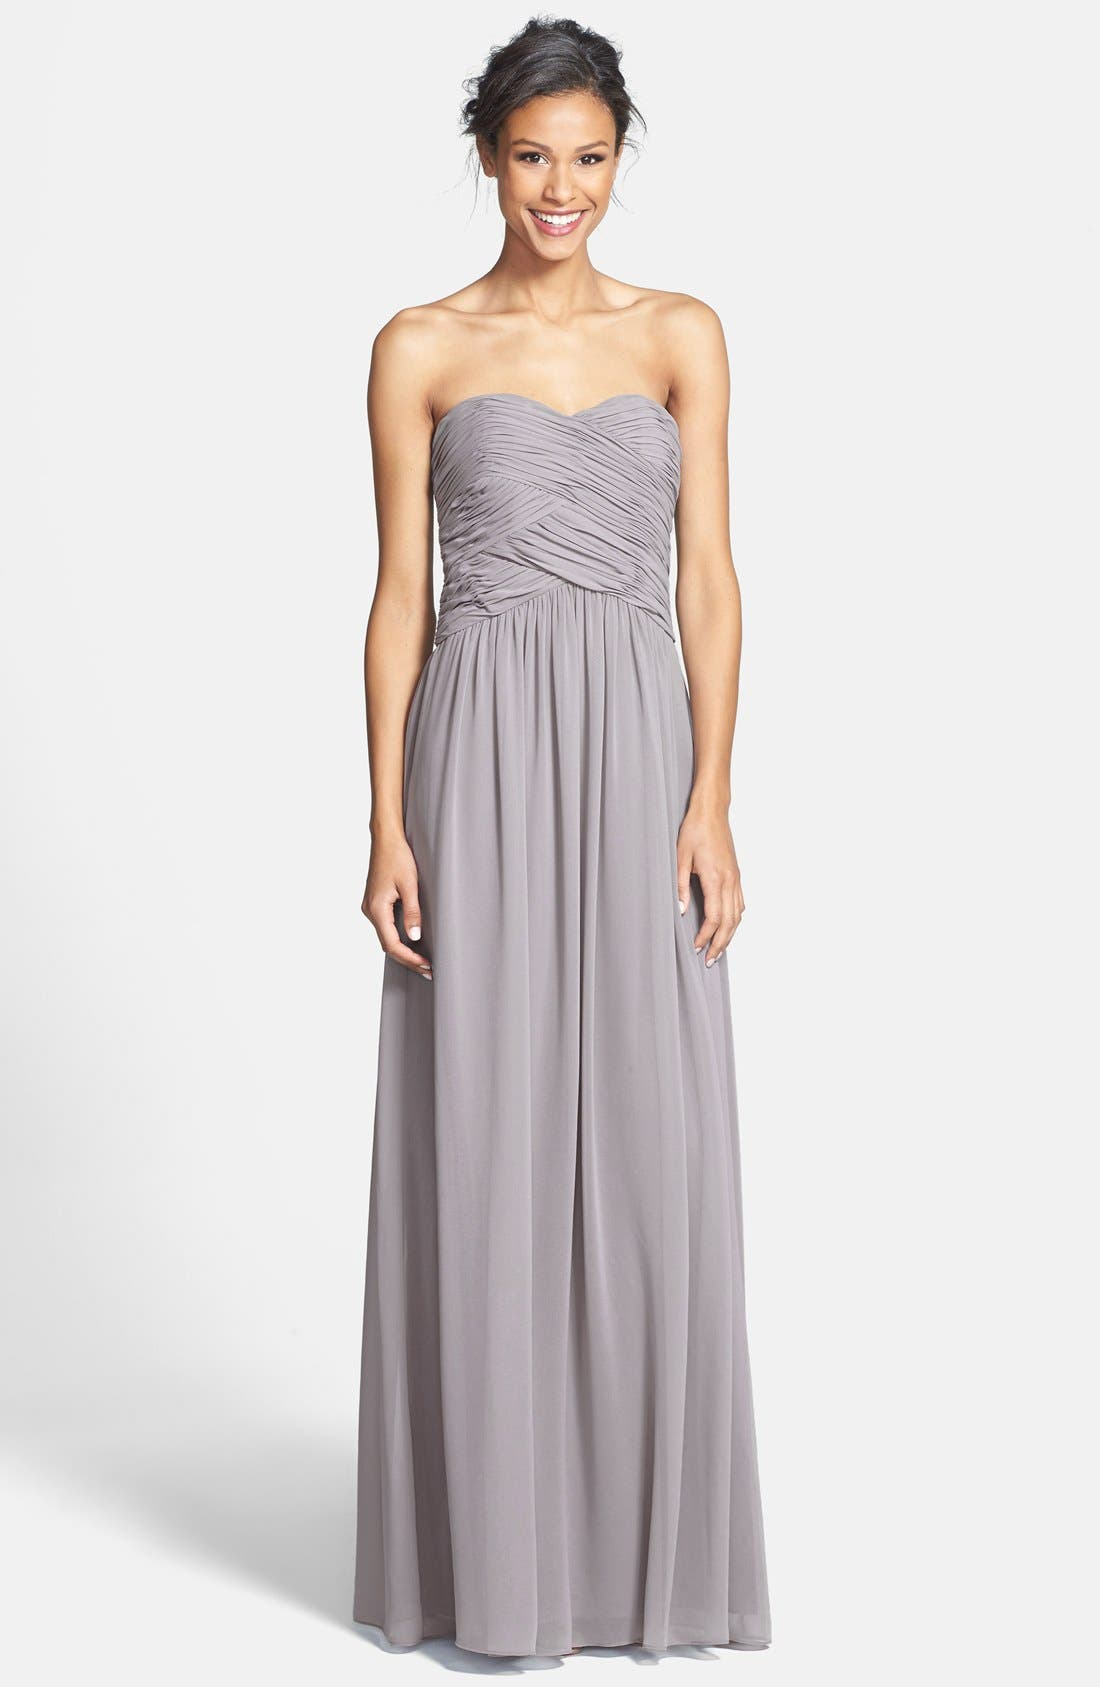 Main Image - Donna Morgan 'Audrey' Strapless Chiffon Gown